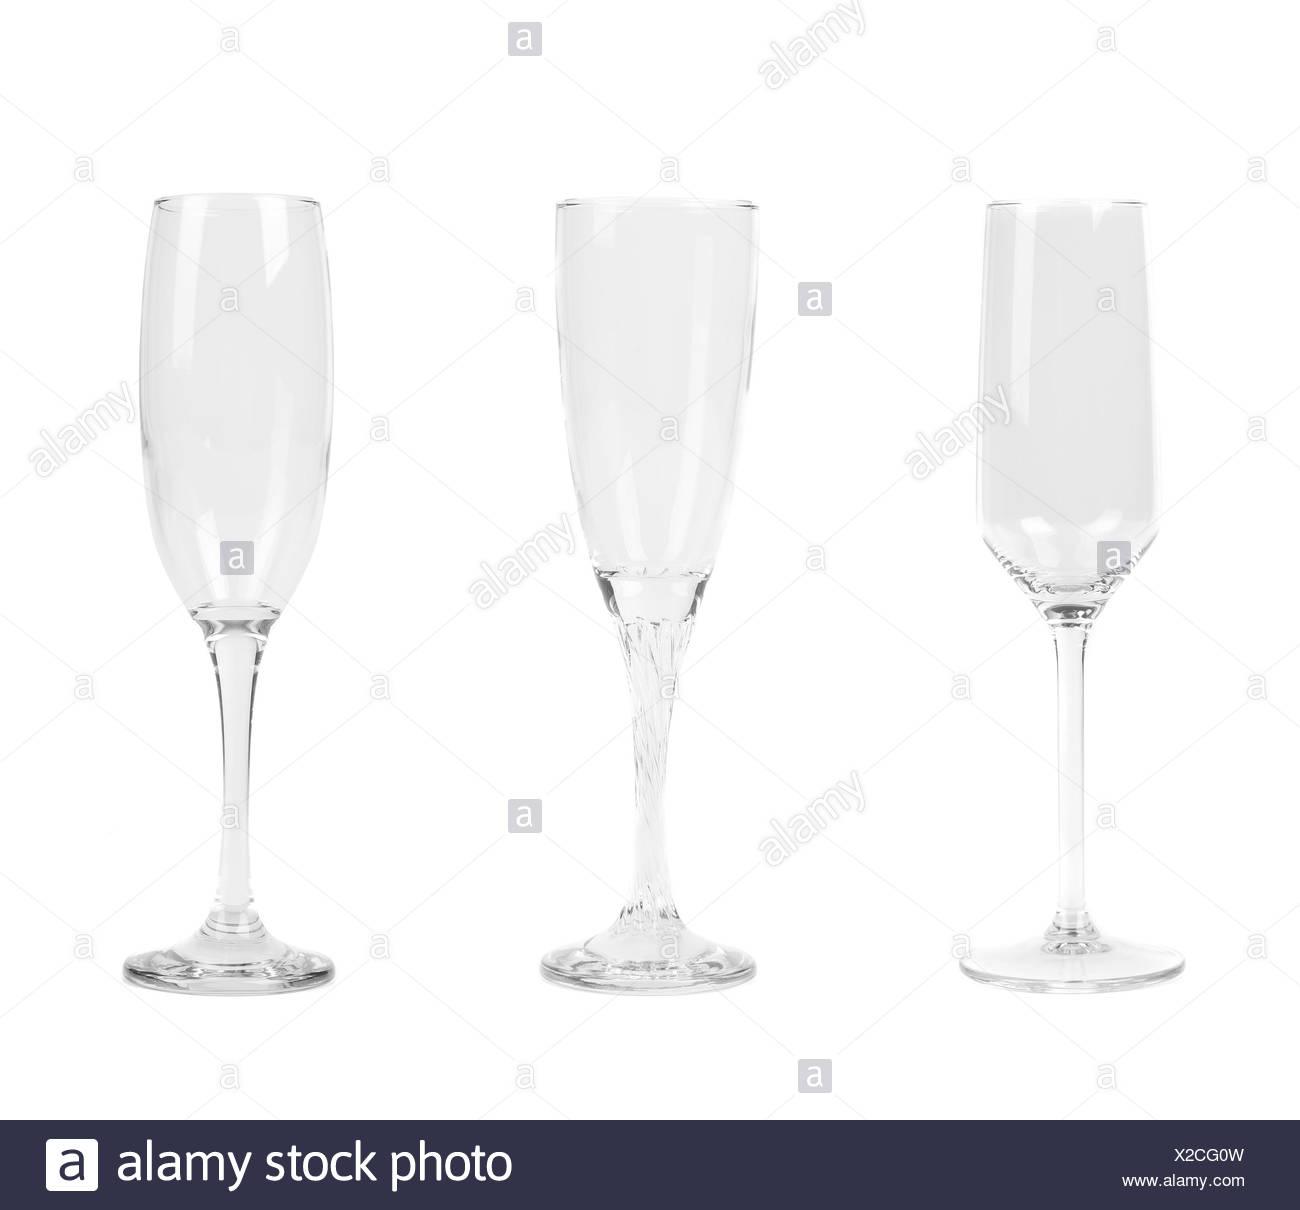 Three different tall wineglasses. - Stock Image